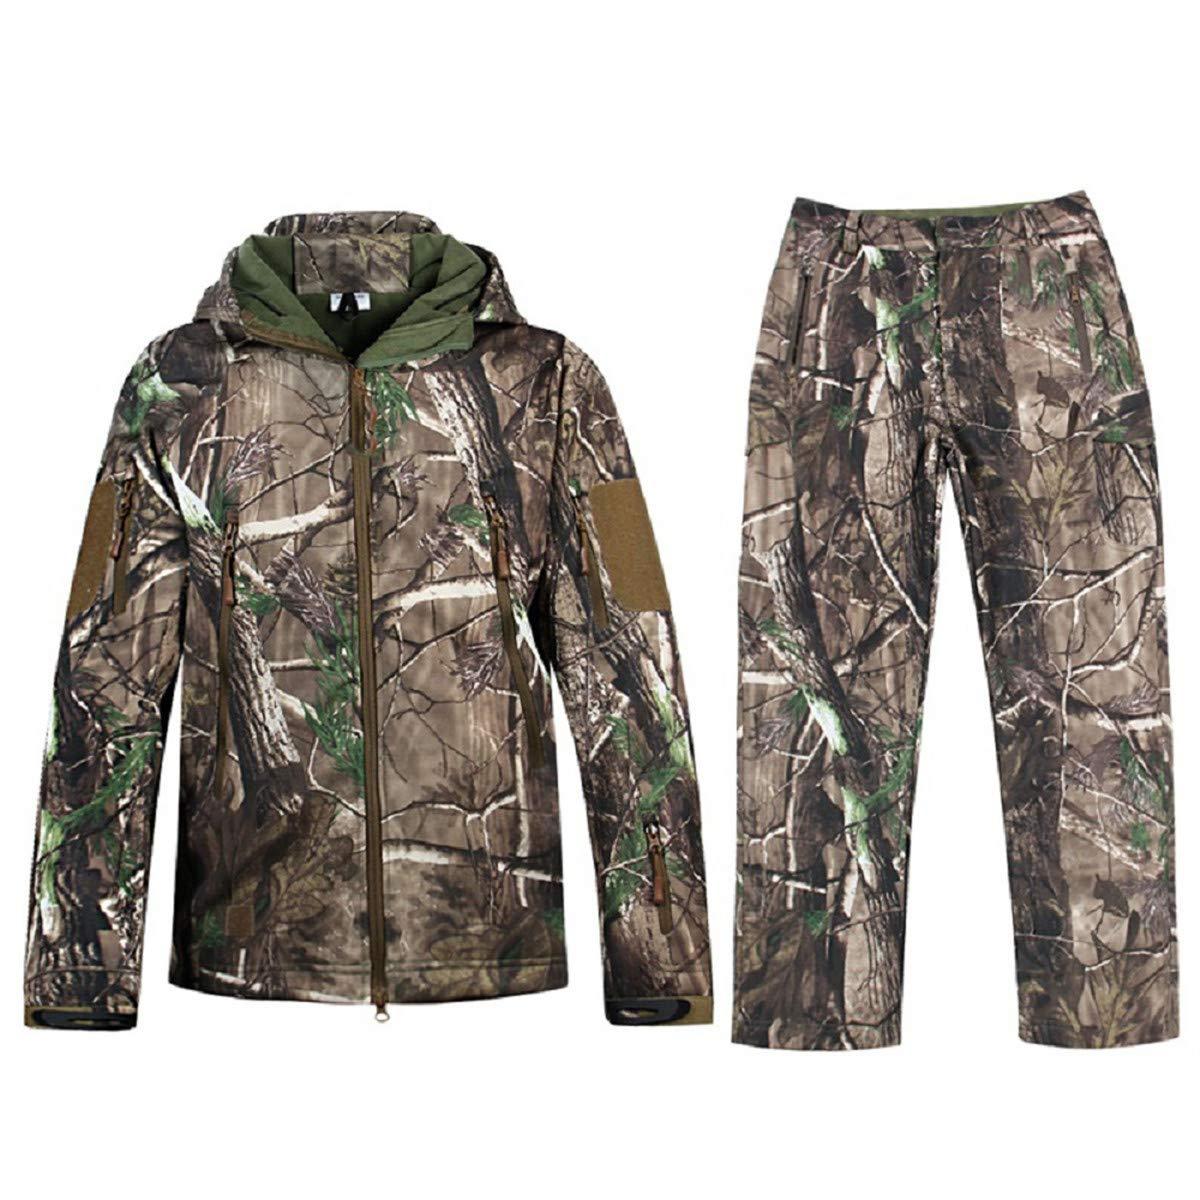 New Men Hunting Camouflage Clothing Waterproof Windproof Hooded Jacket /& Pants